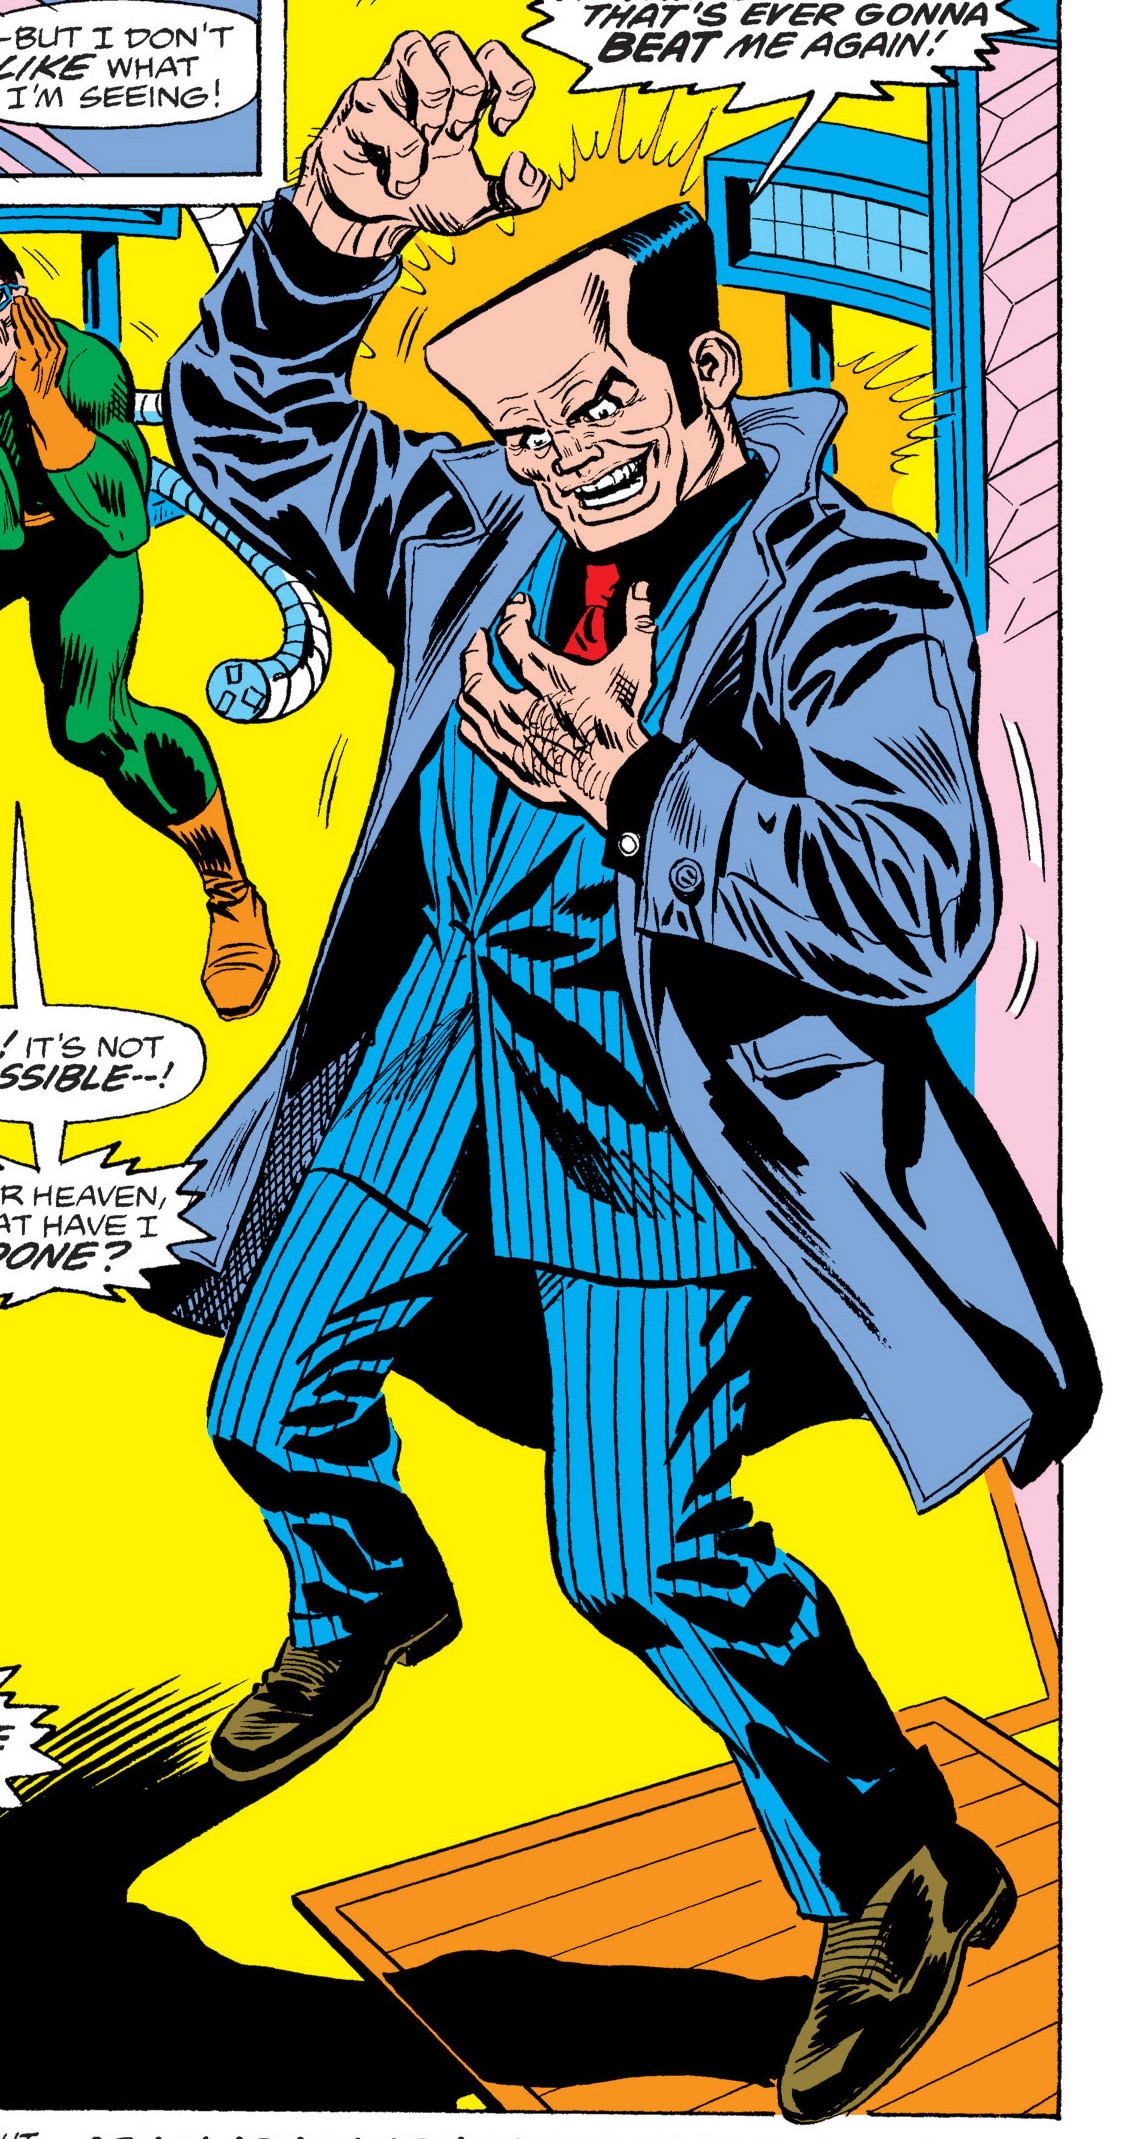 Hammerhead (Joseph) (Earth-616) from Amazing Spider-Man Vol 1 158 001.jpg